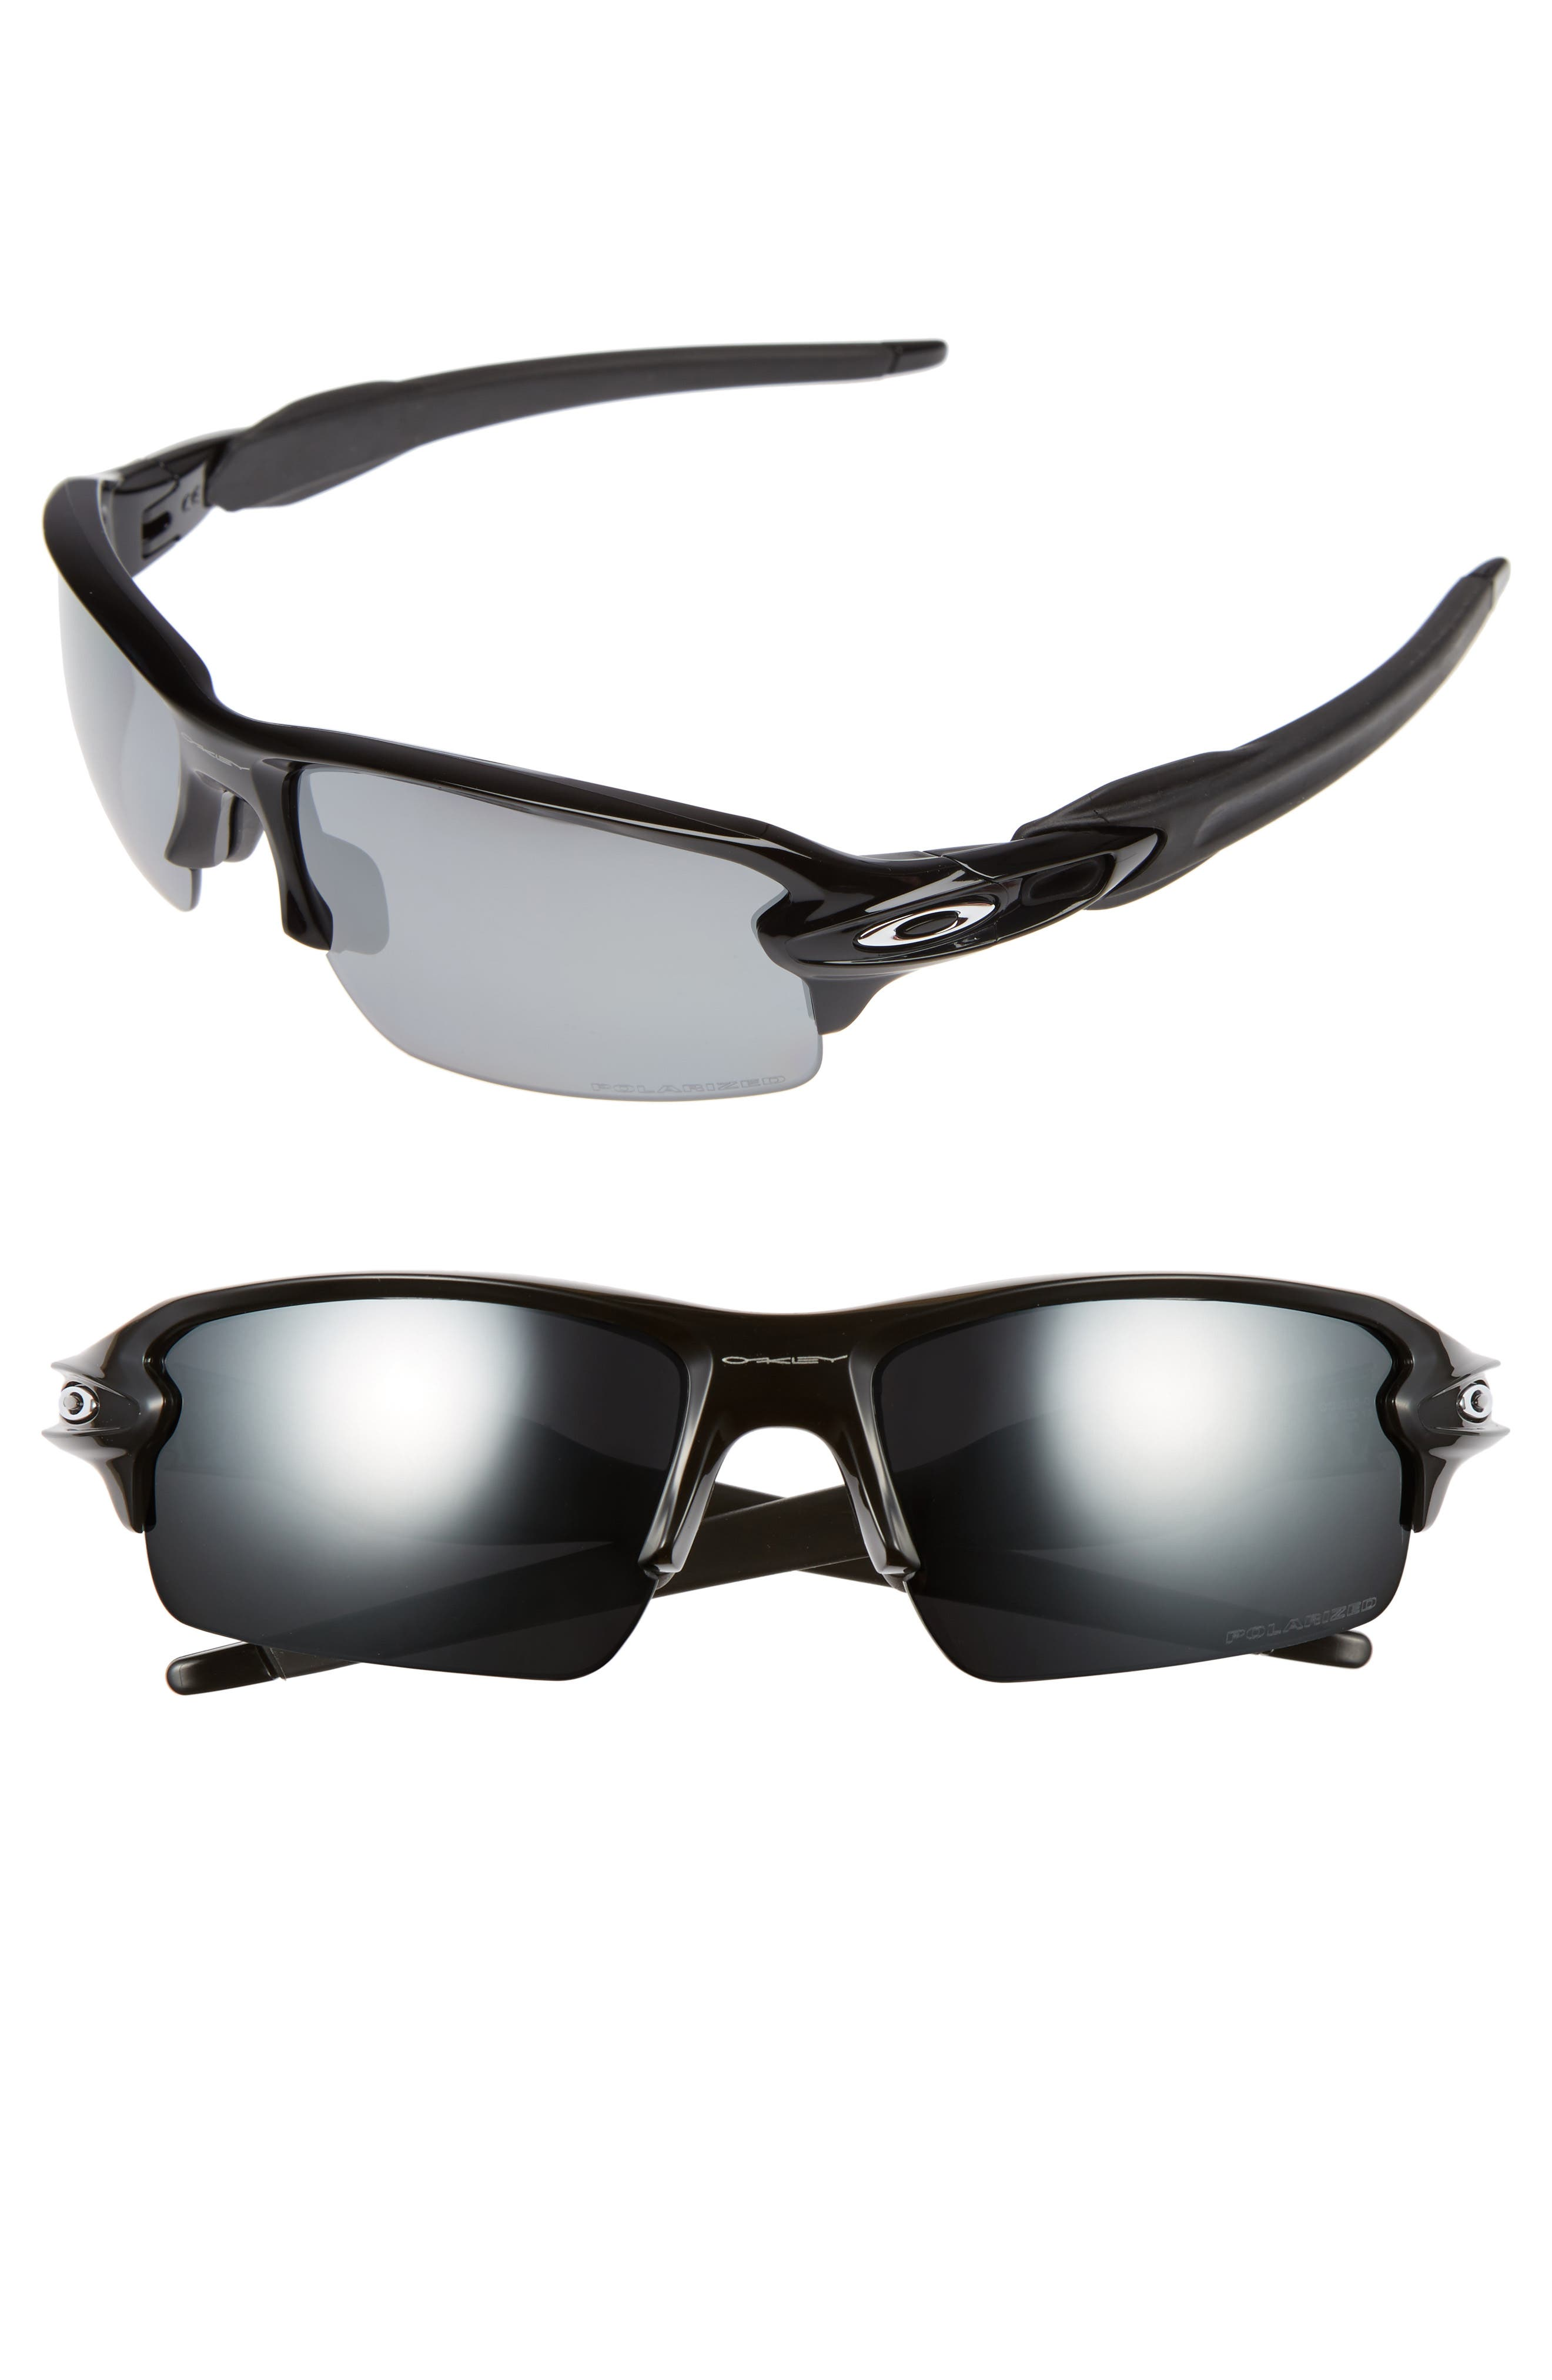 Alternate Image 1 Selected - Oakley Flak 2.0 59mm Polarized Sunglasses